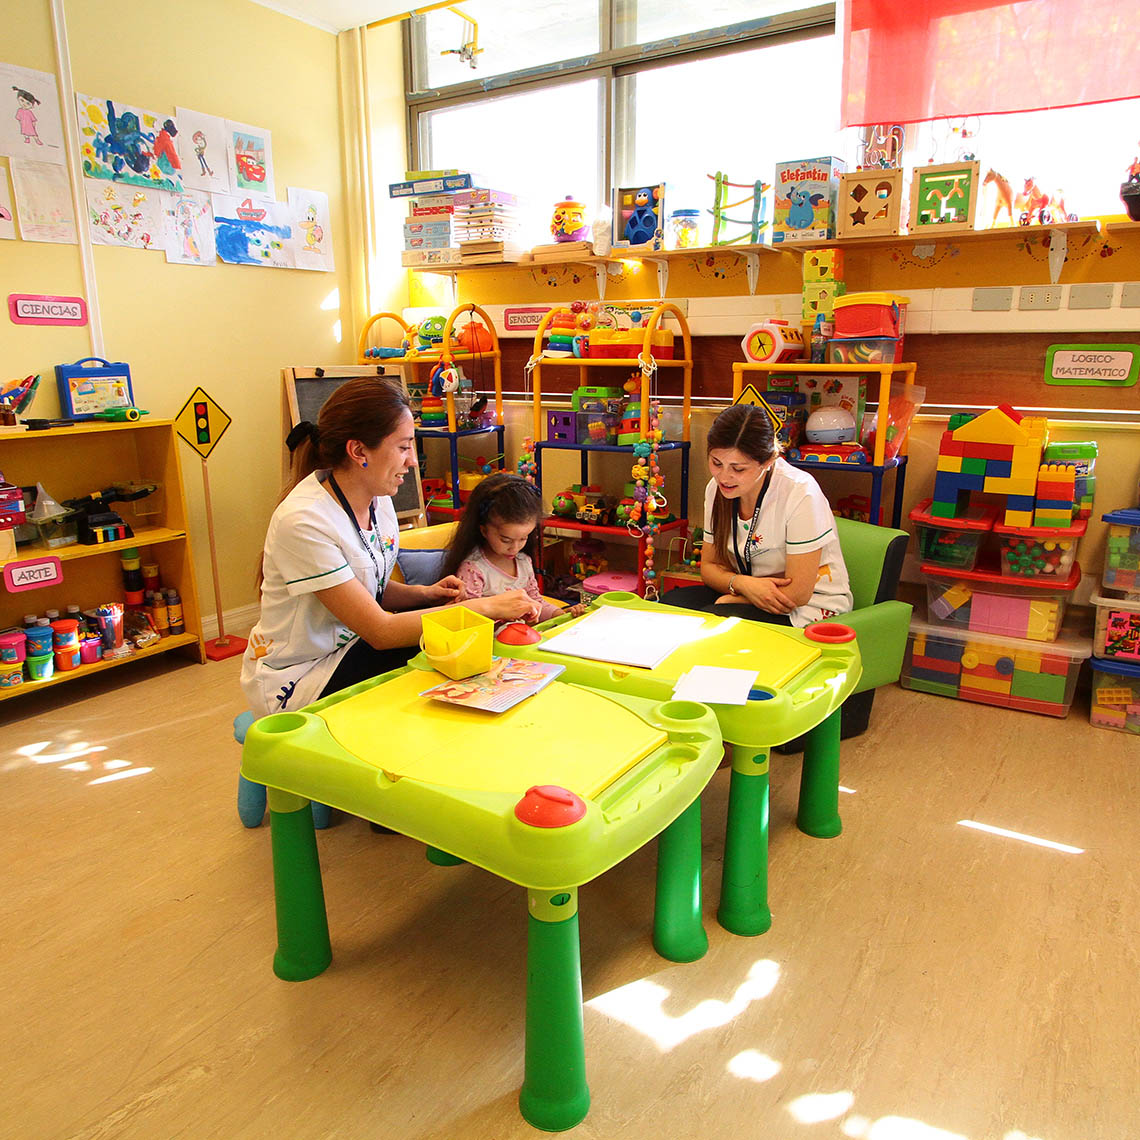 Jardín Infantil al Hospital - Modalidad no convencional